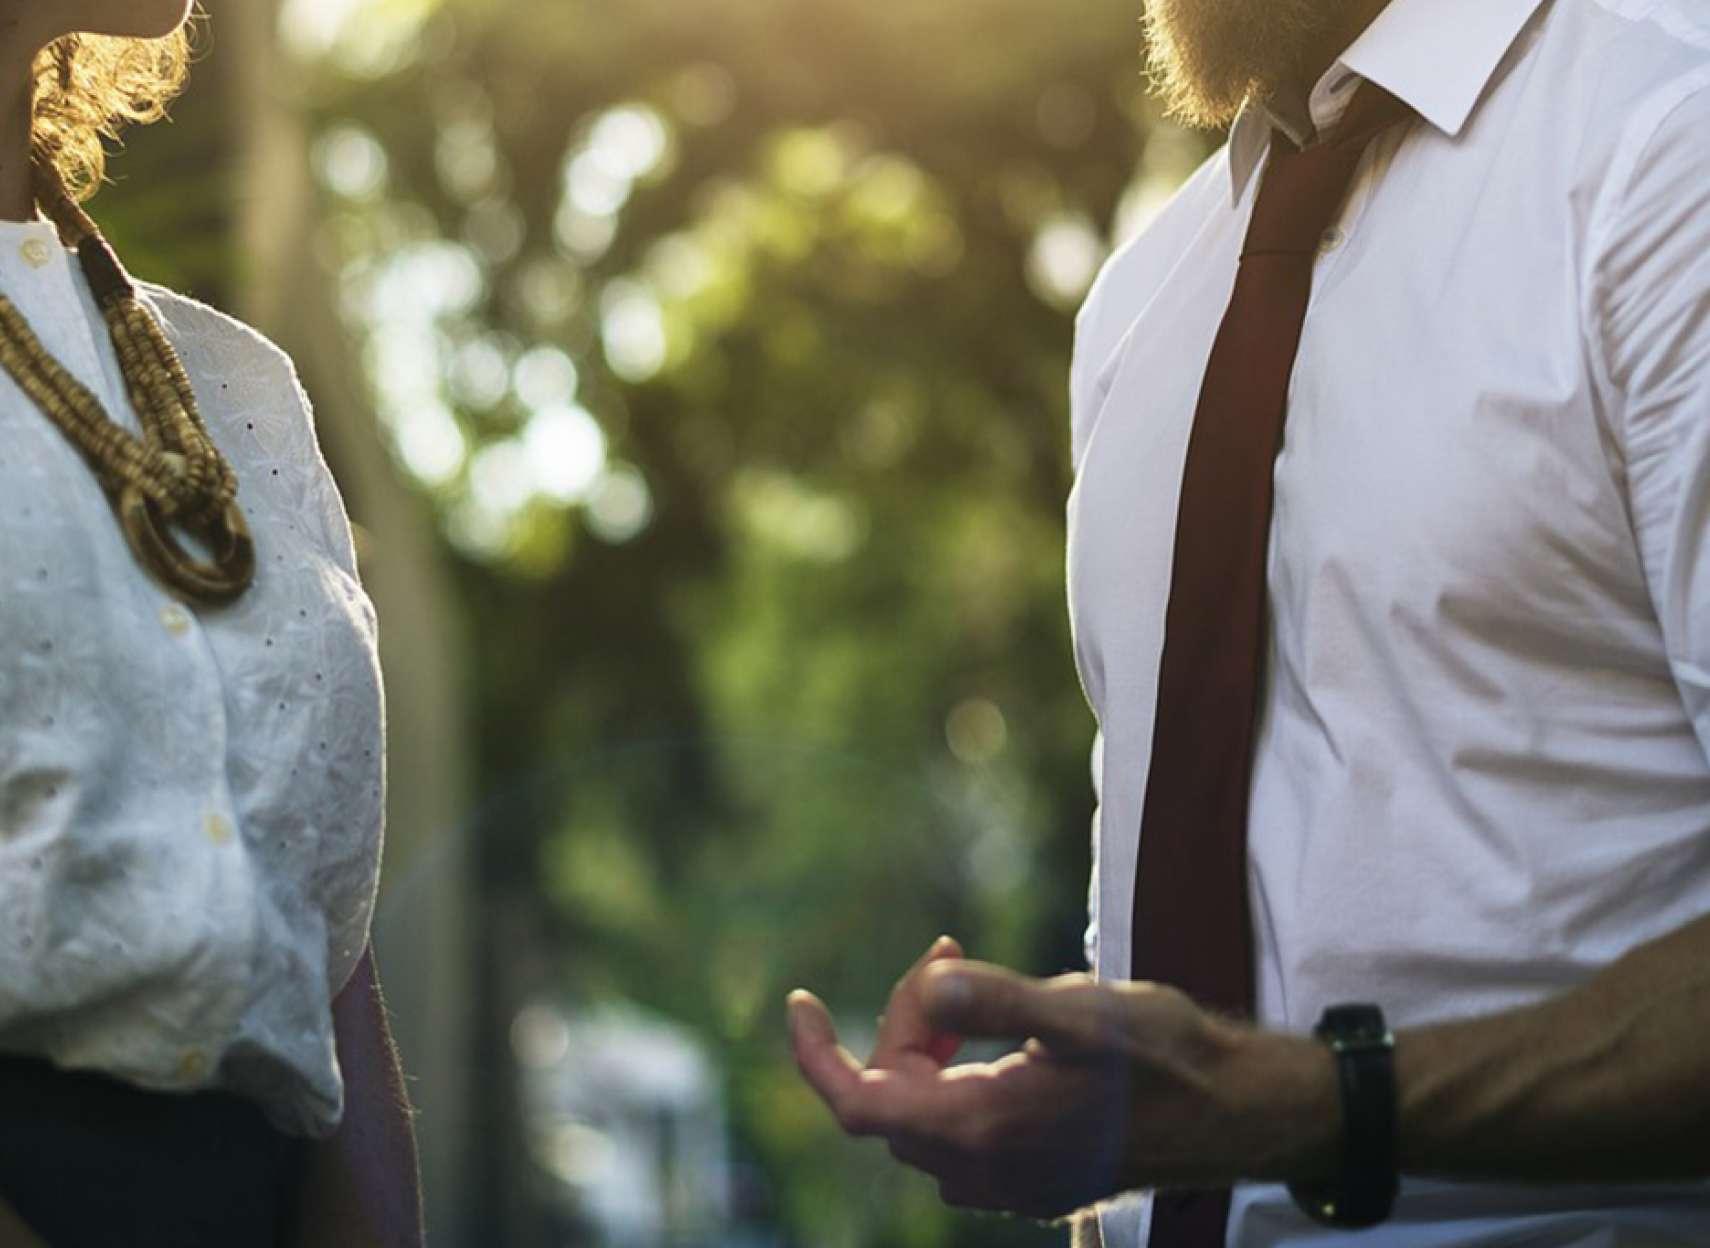 psycology-daee-couples-speak